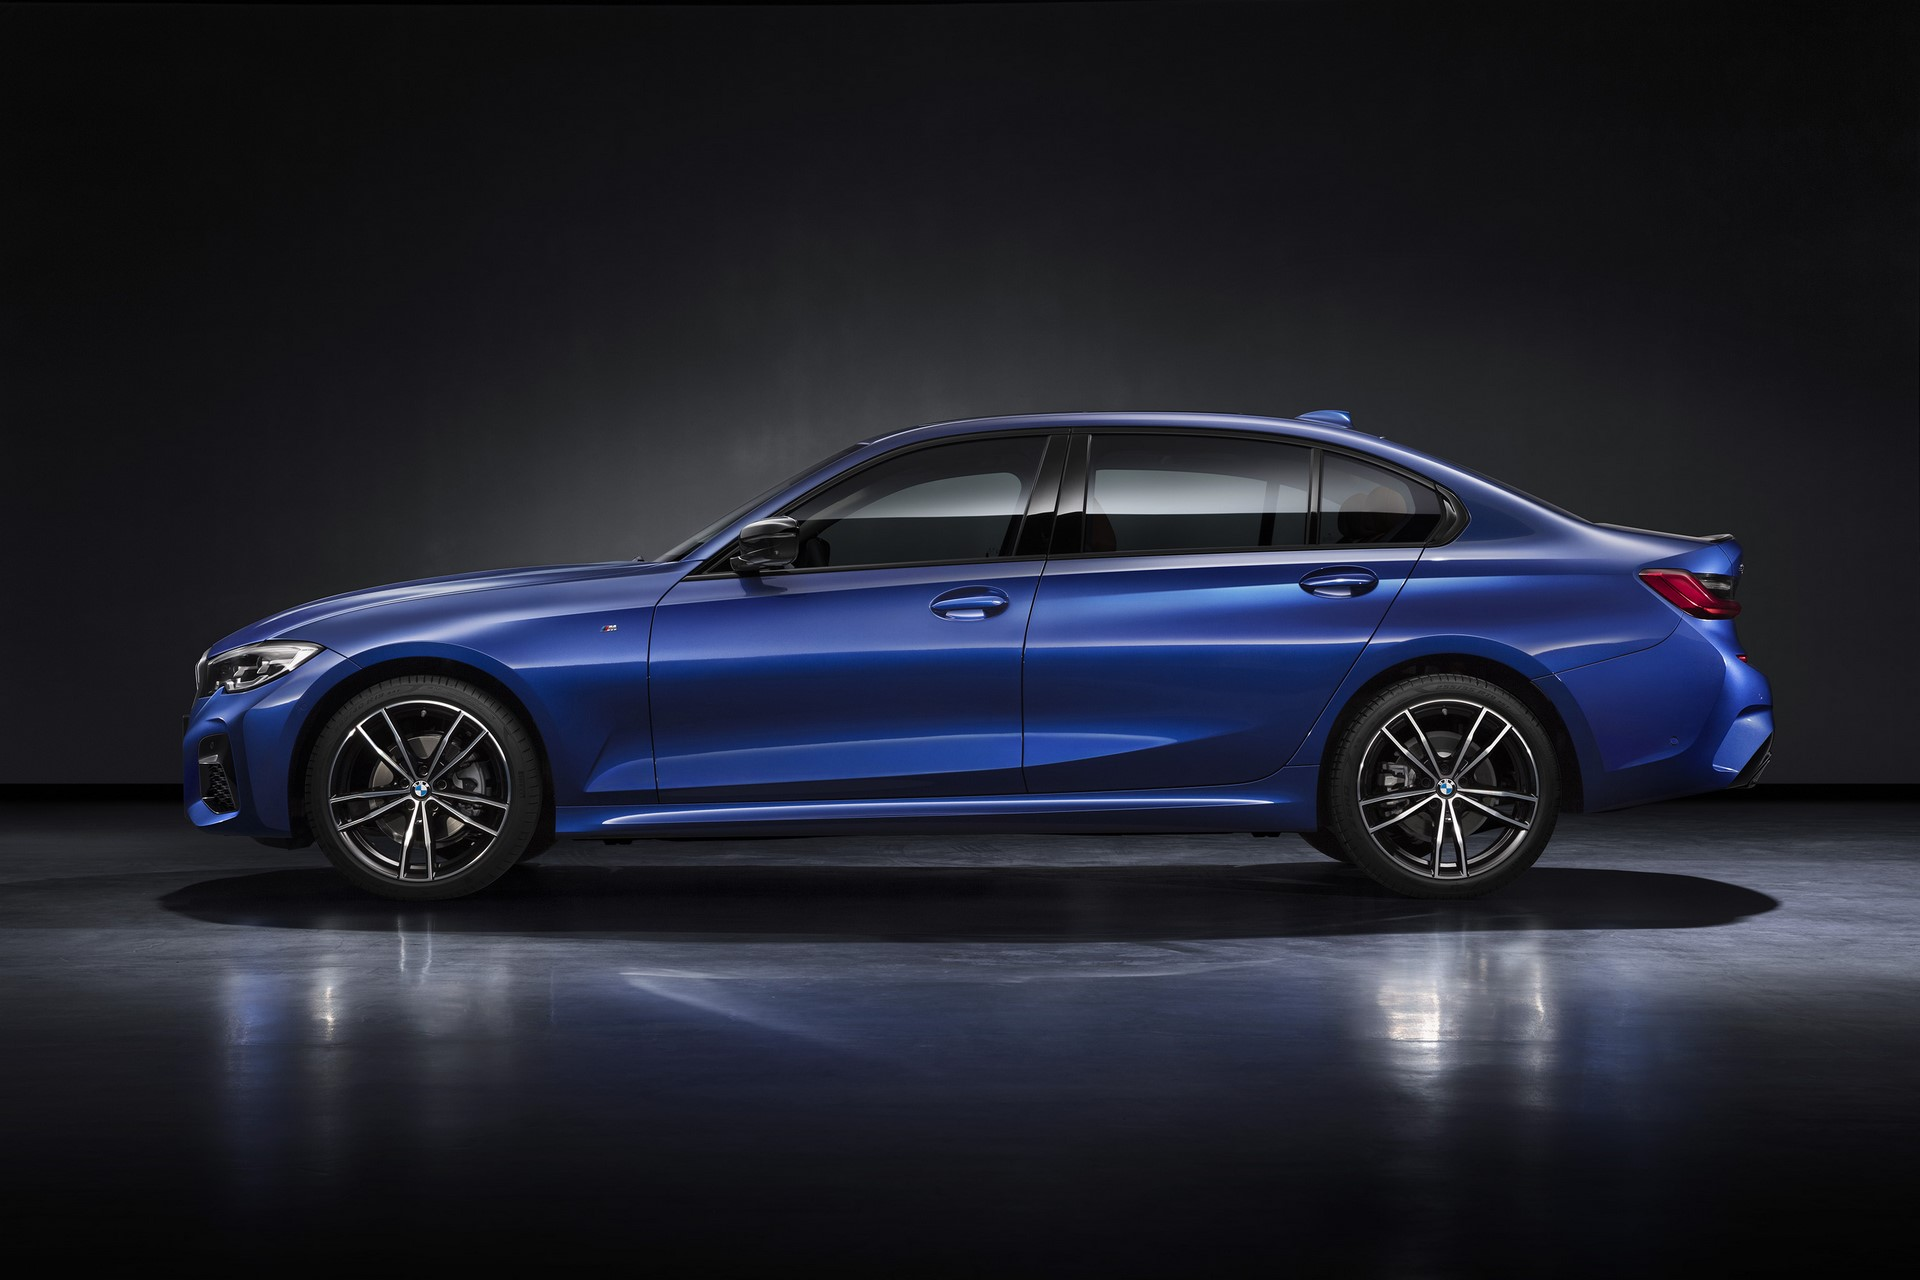 BMW-3-Series-LWB-Long-Wheelbase-2019-9